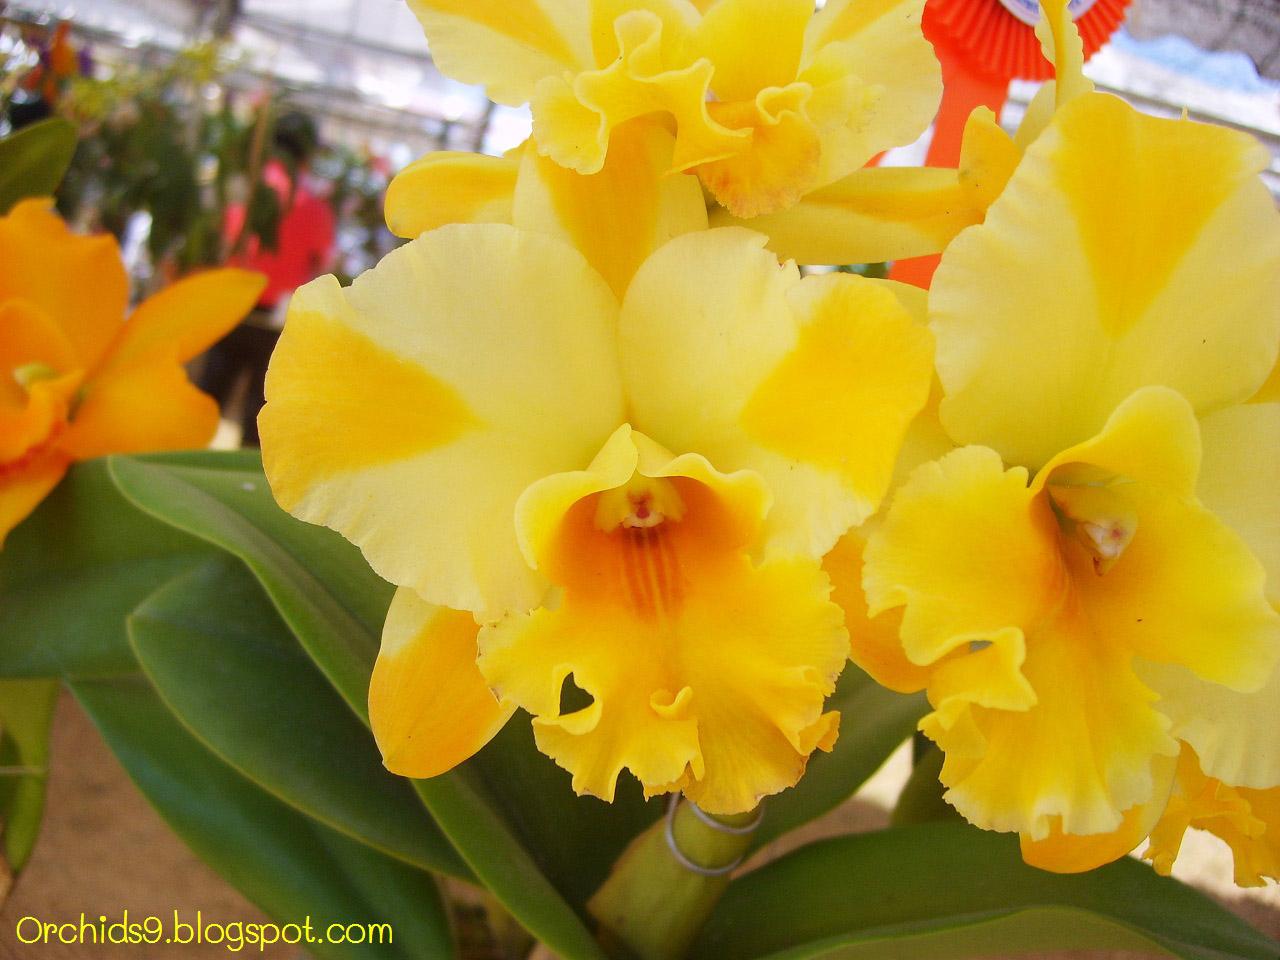 Orchids flowers pictures bulbophyllum vanda cattleya for Orchidea cattleya